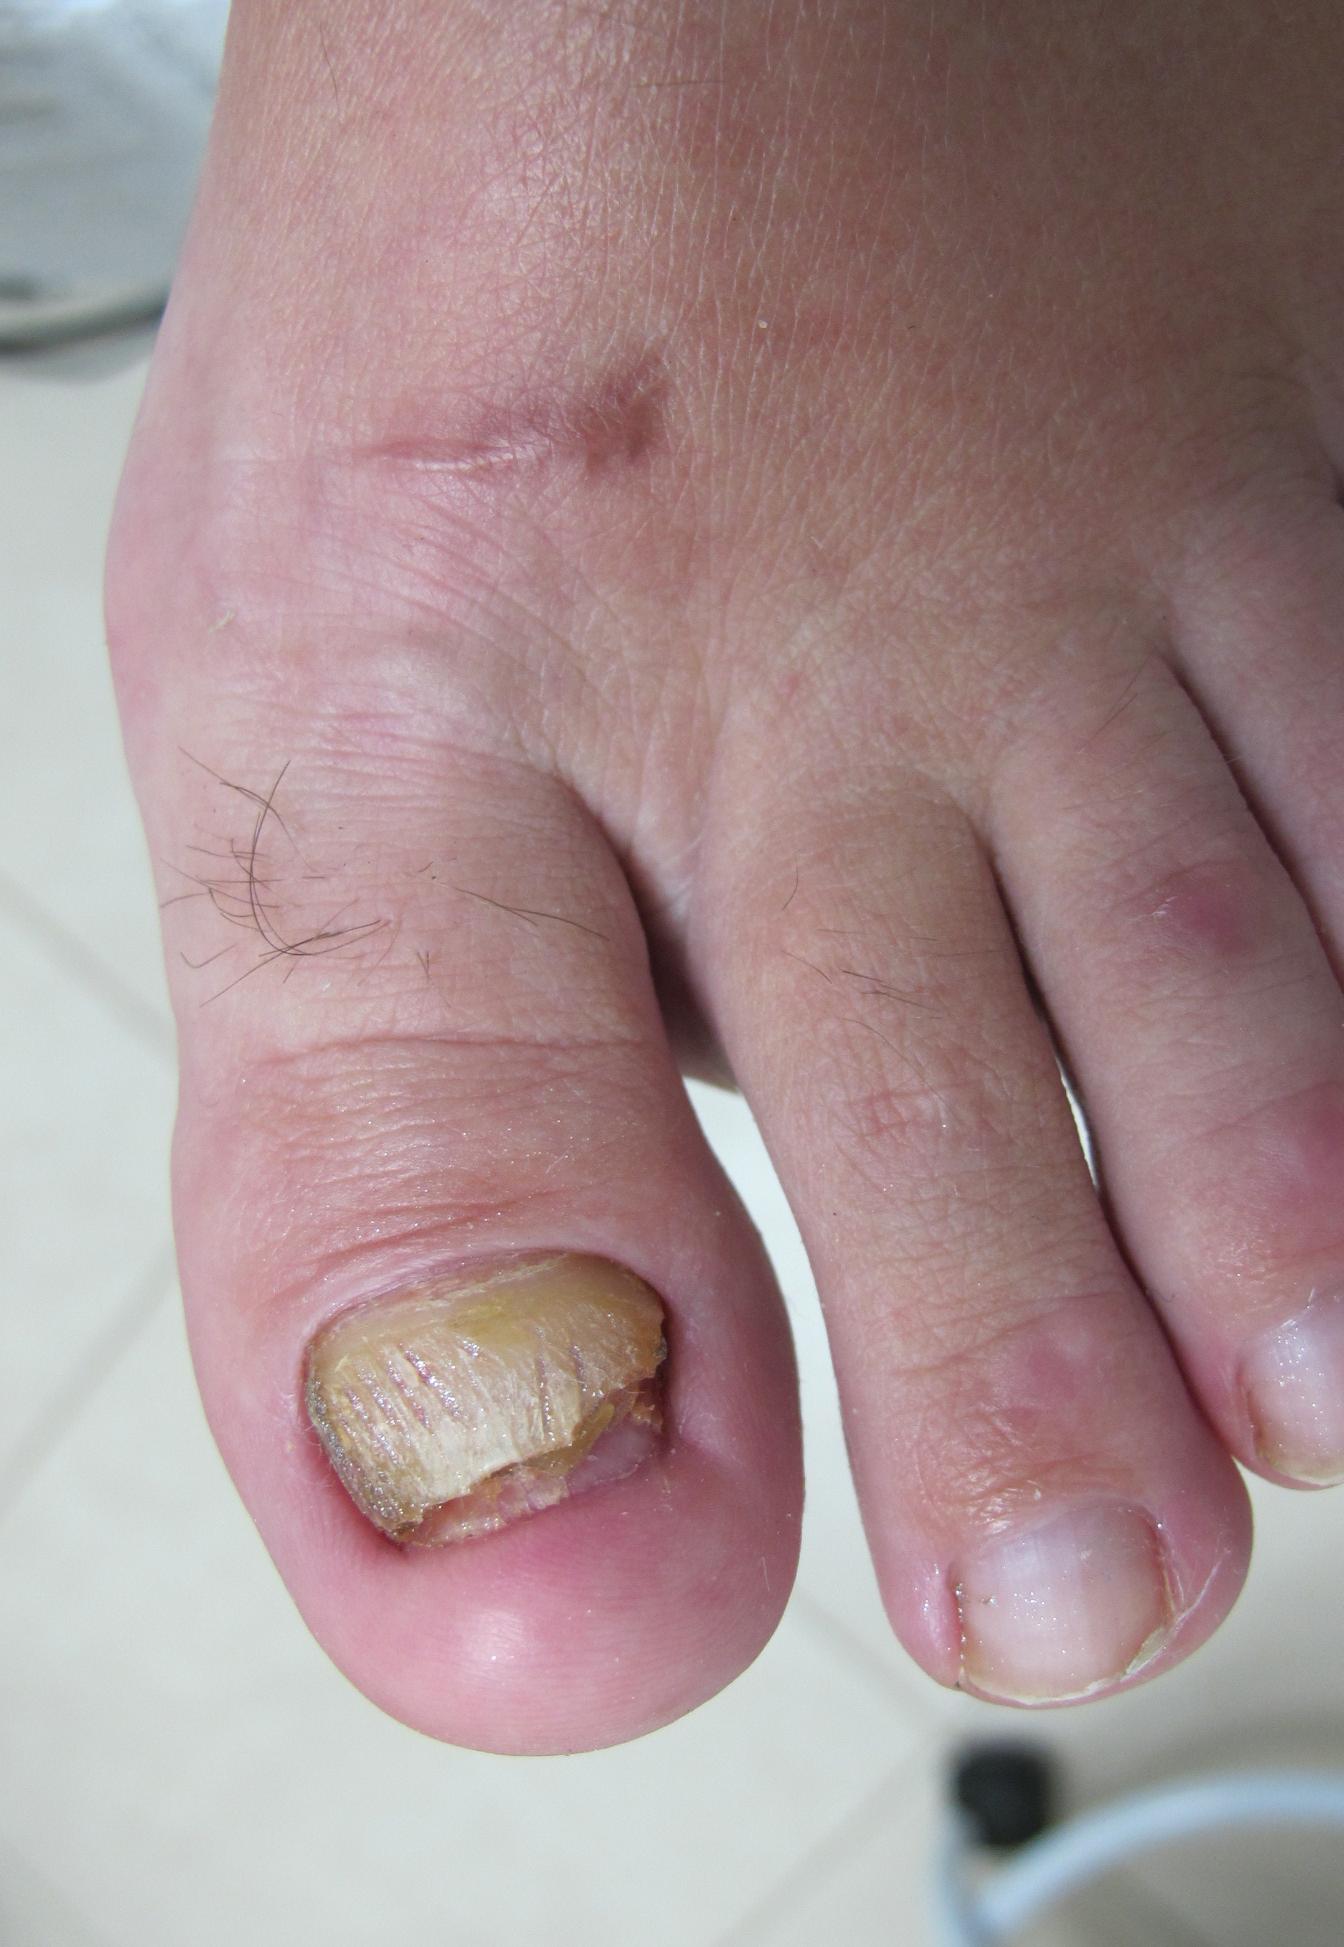 Гнойный грибок на пальцах ног